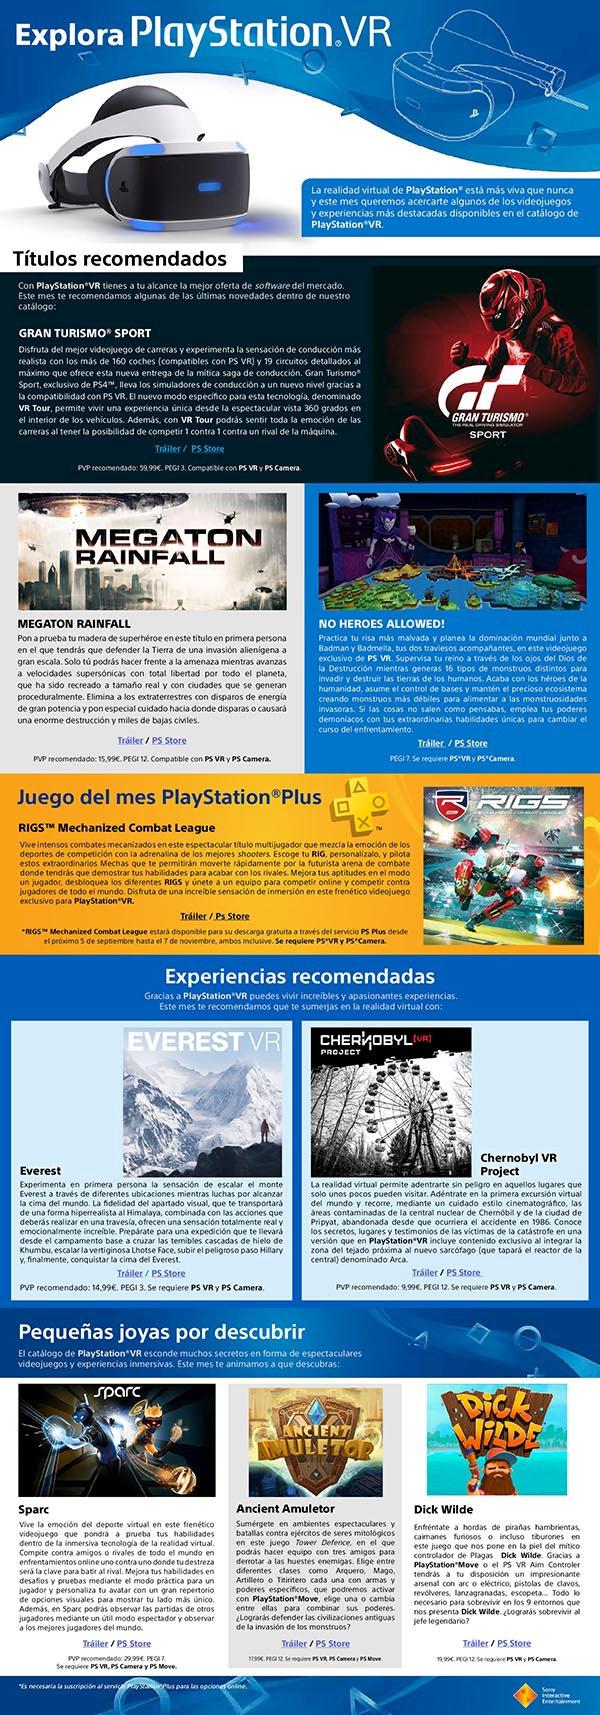 Explora PlayStation VR - Octubre 2017